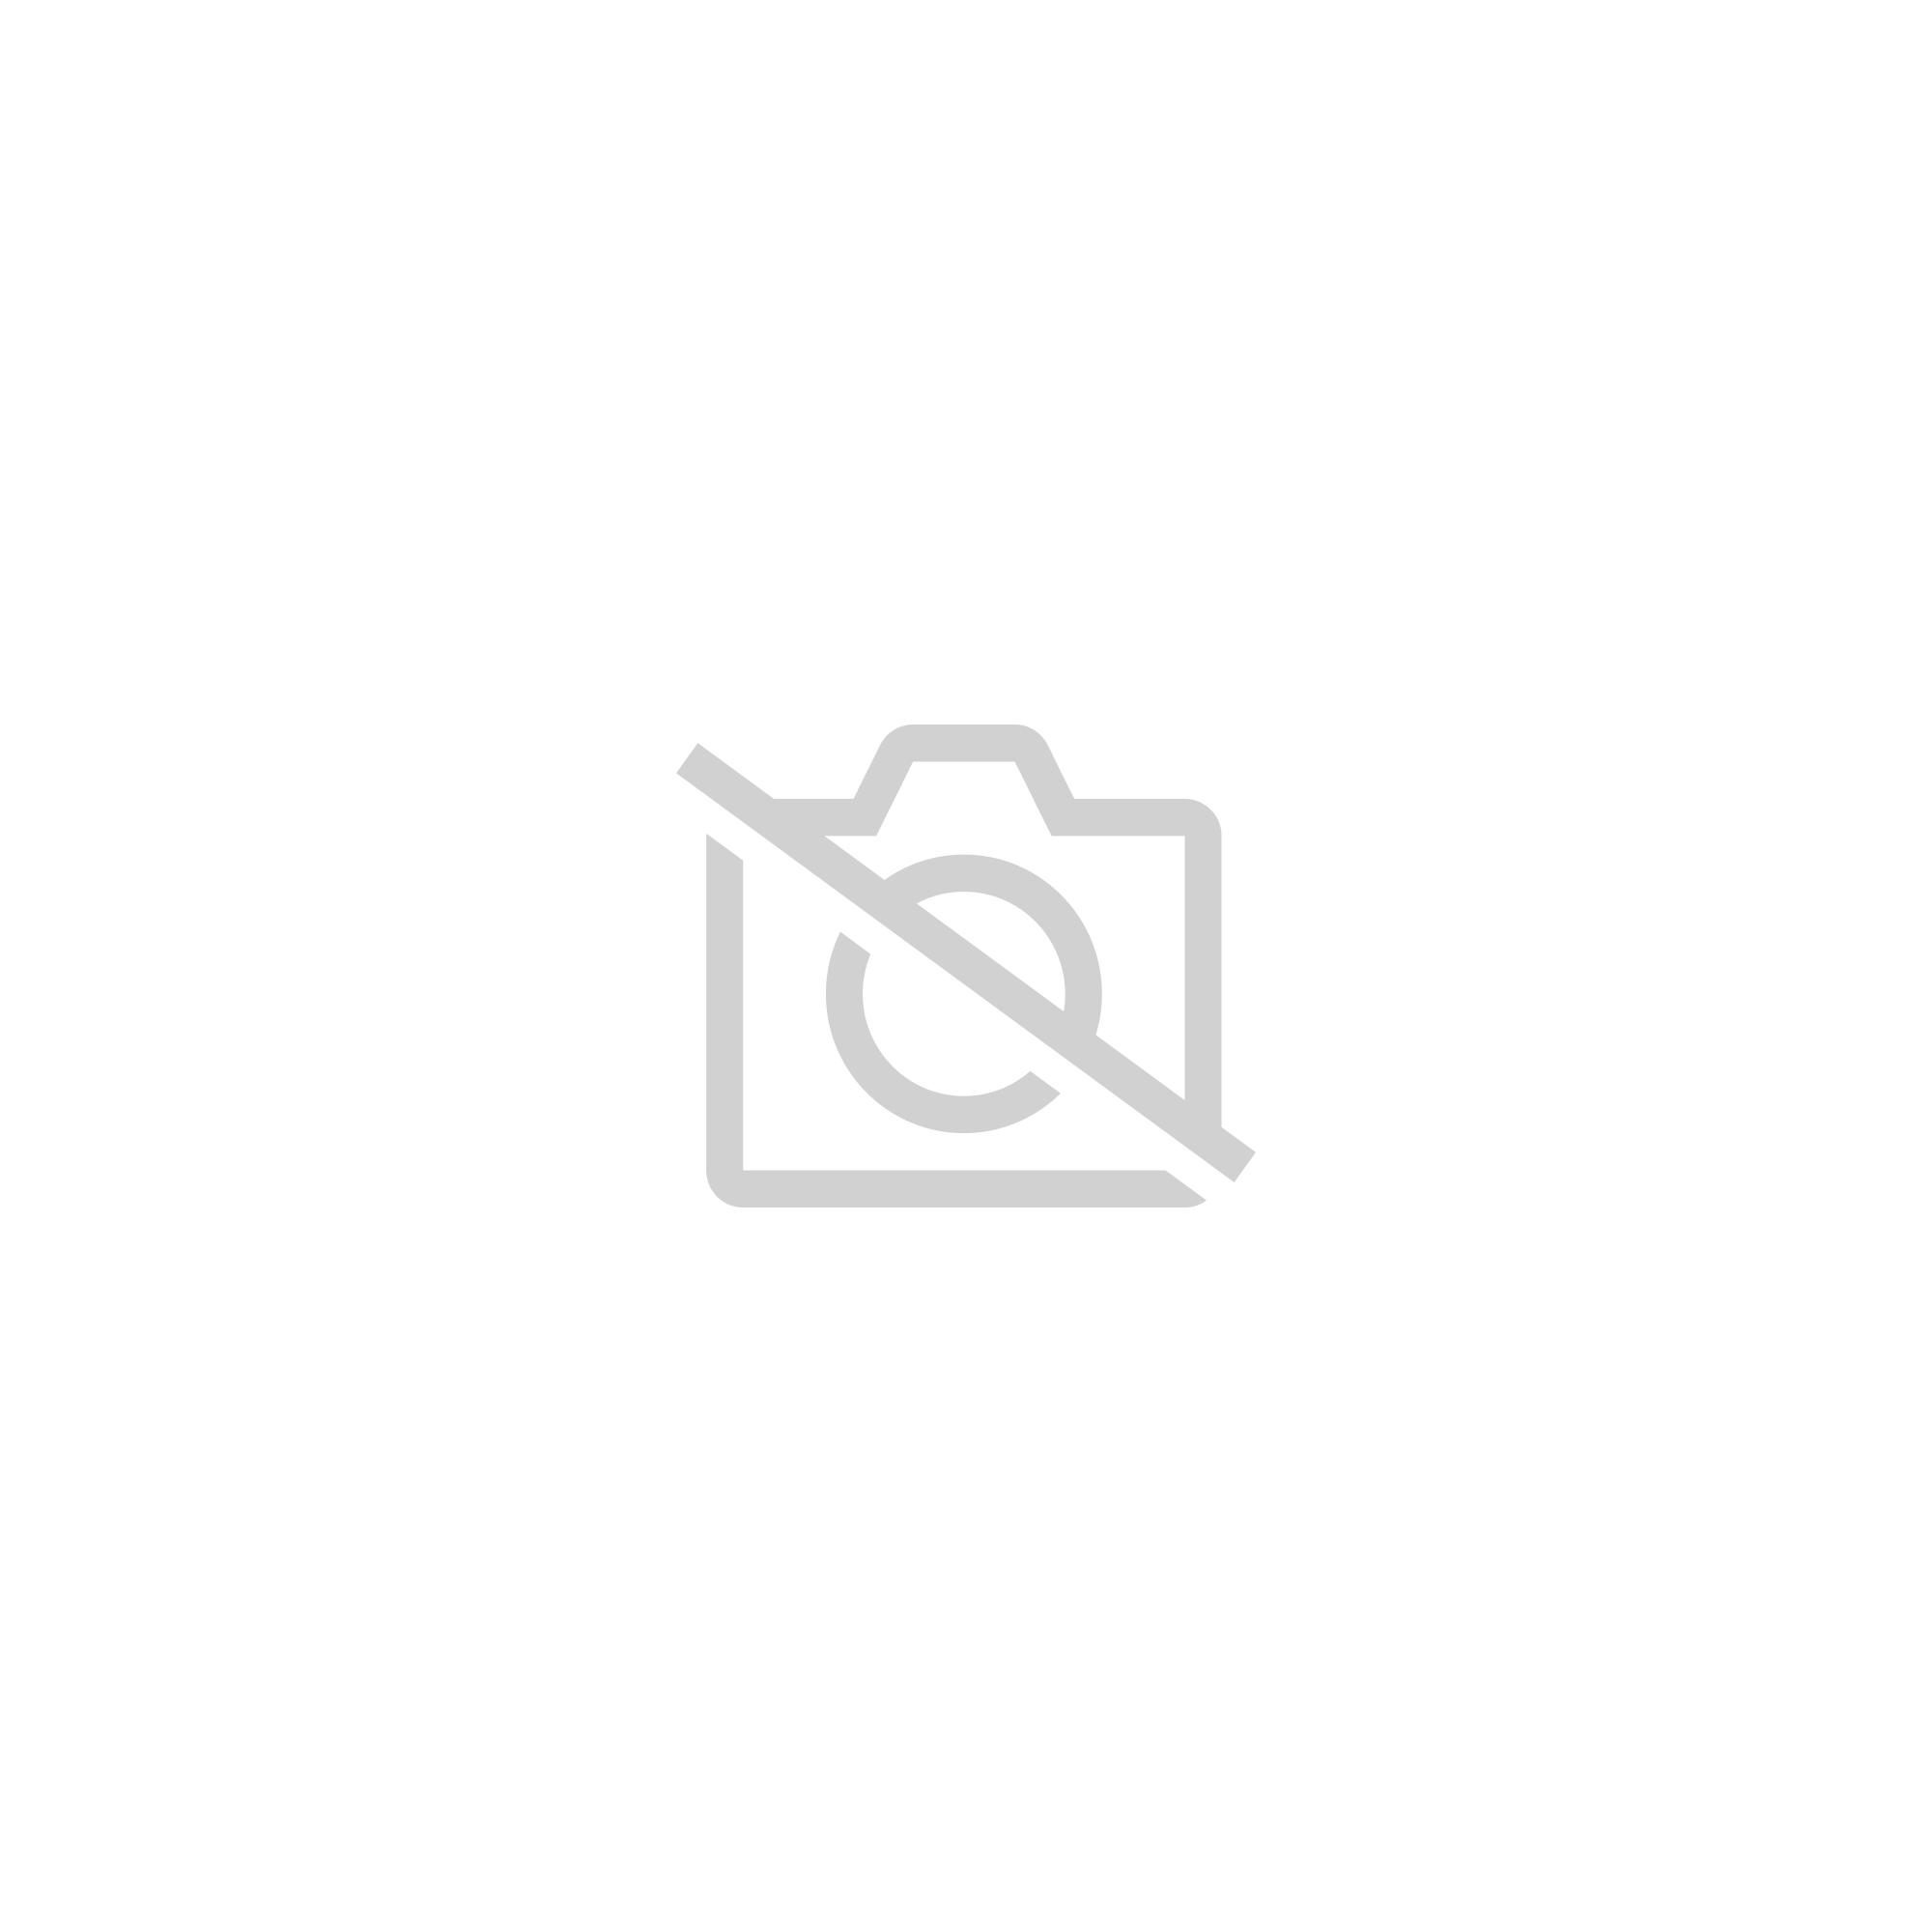 Lotus Baby Original Maxi Carre 70 Cotons - Lot De 10